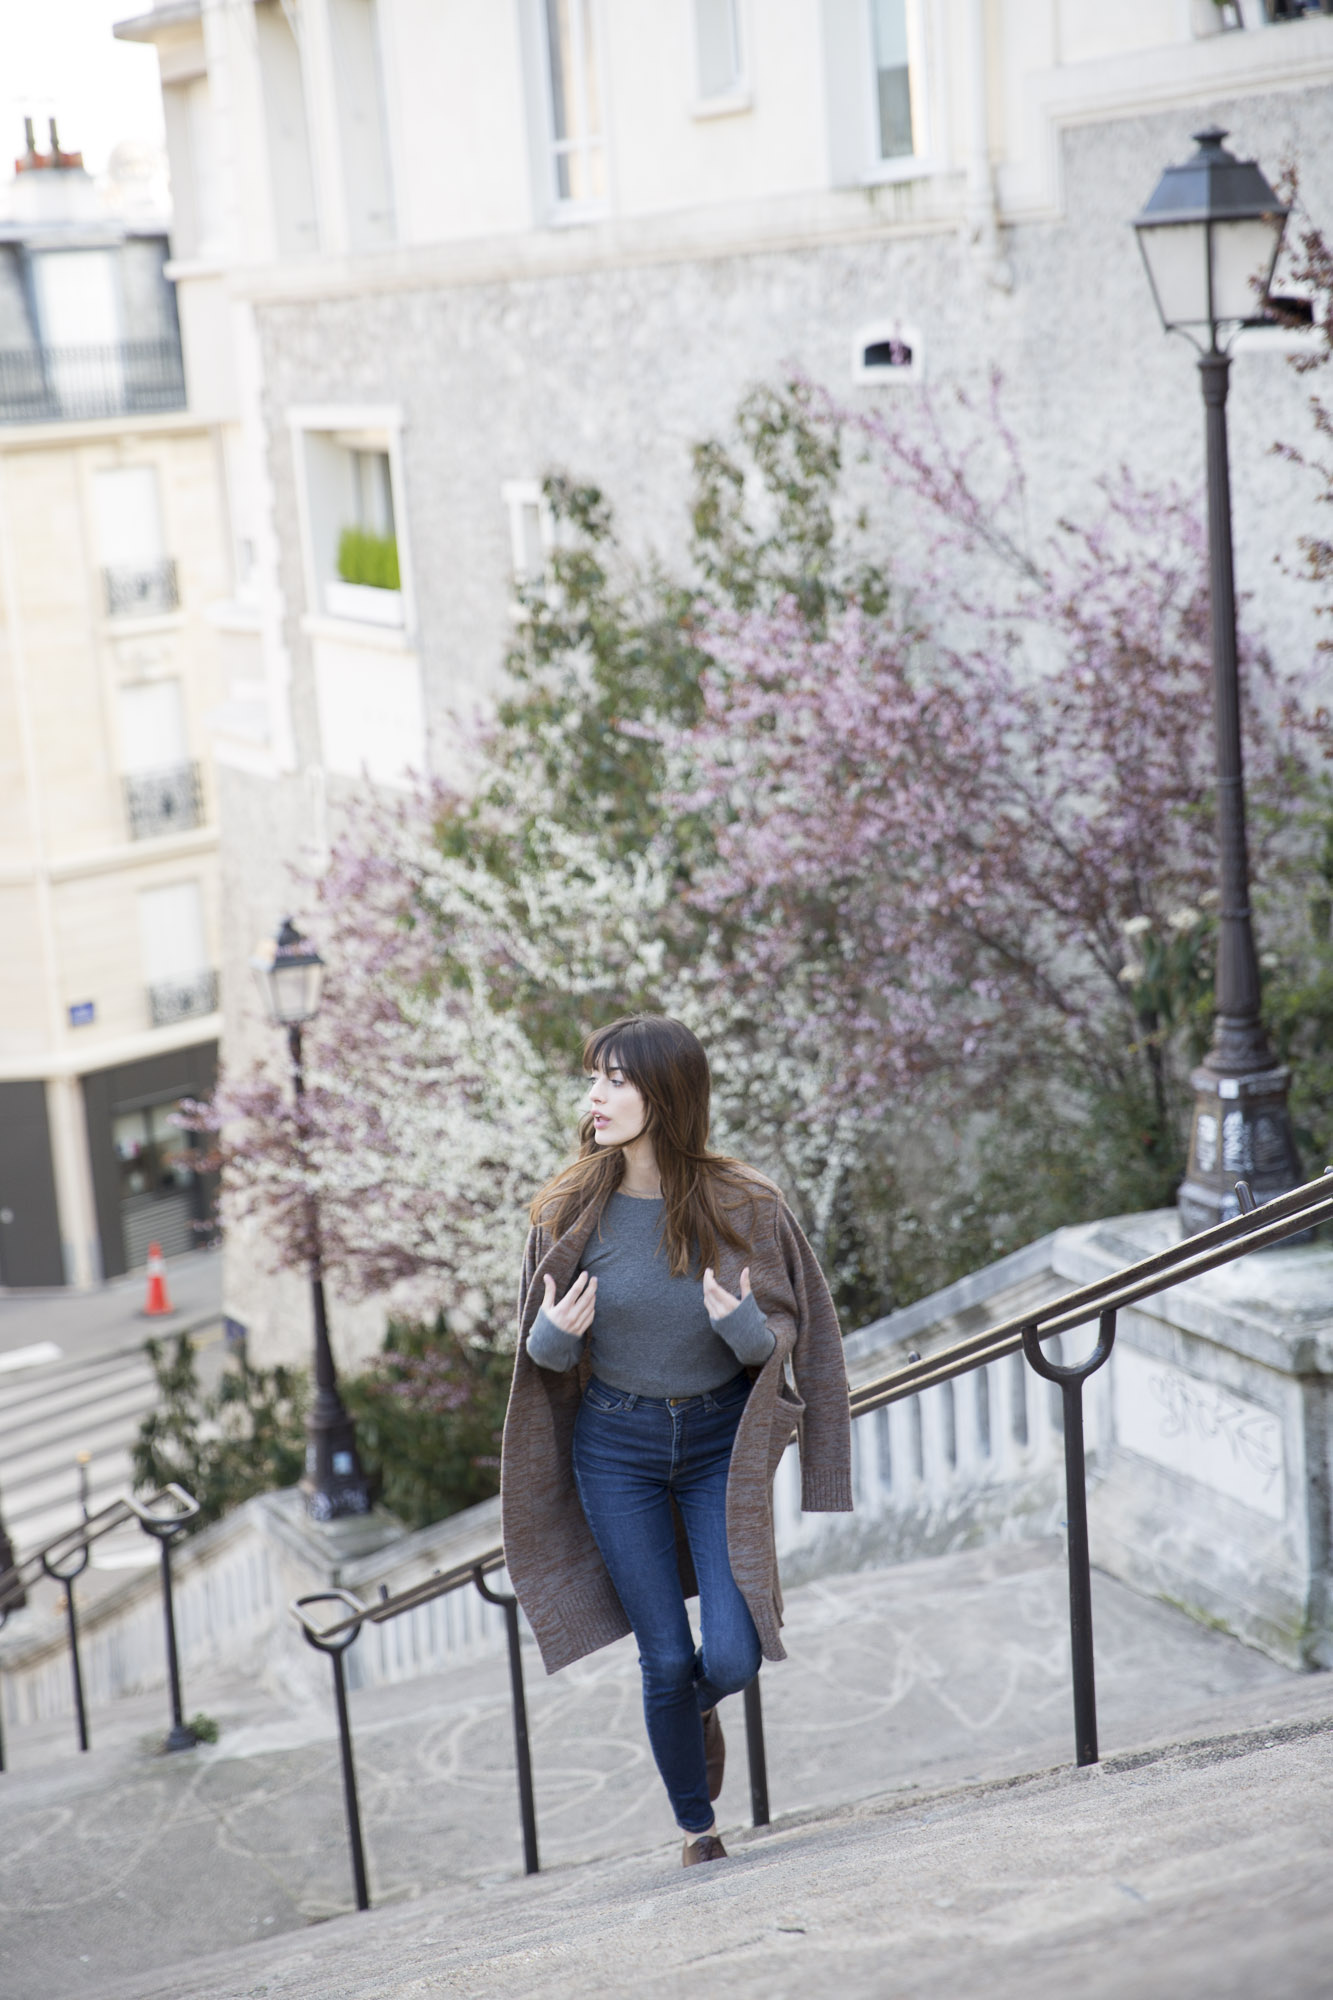 lookbook-kujten-folkr-winter-2016-blog-mode-lifestyle-16